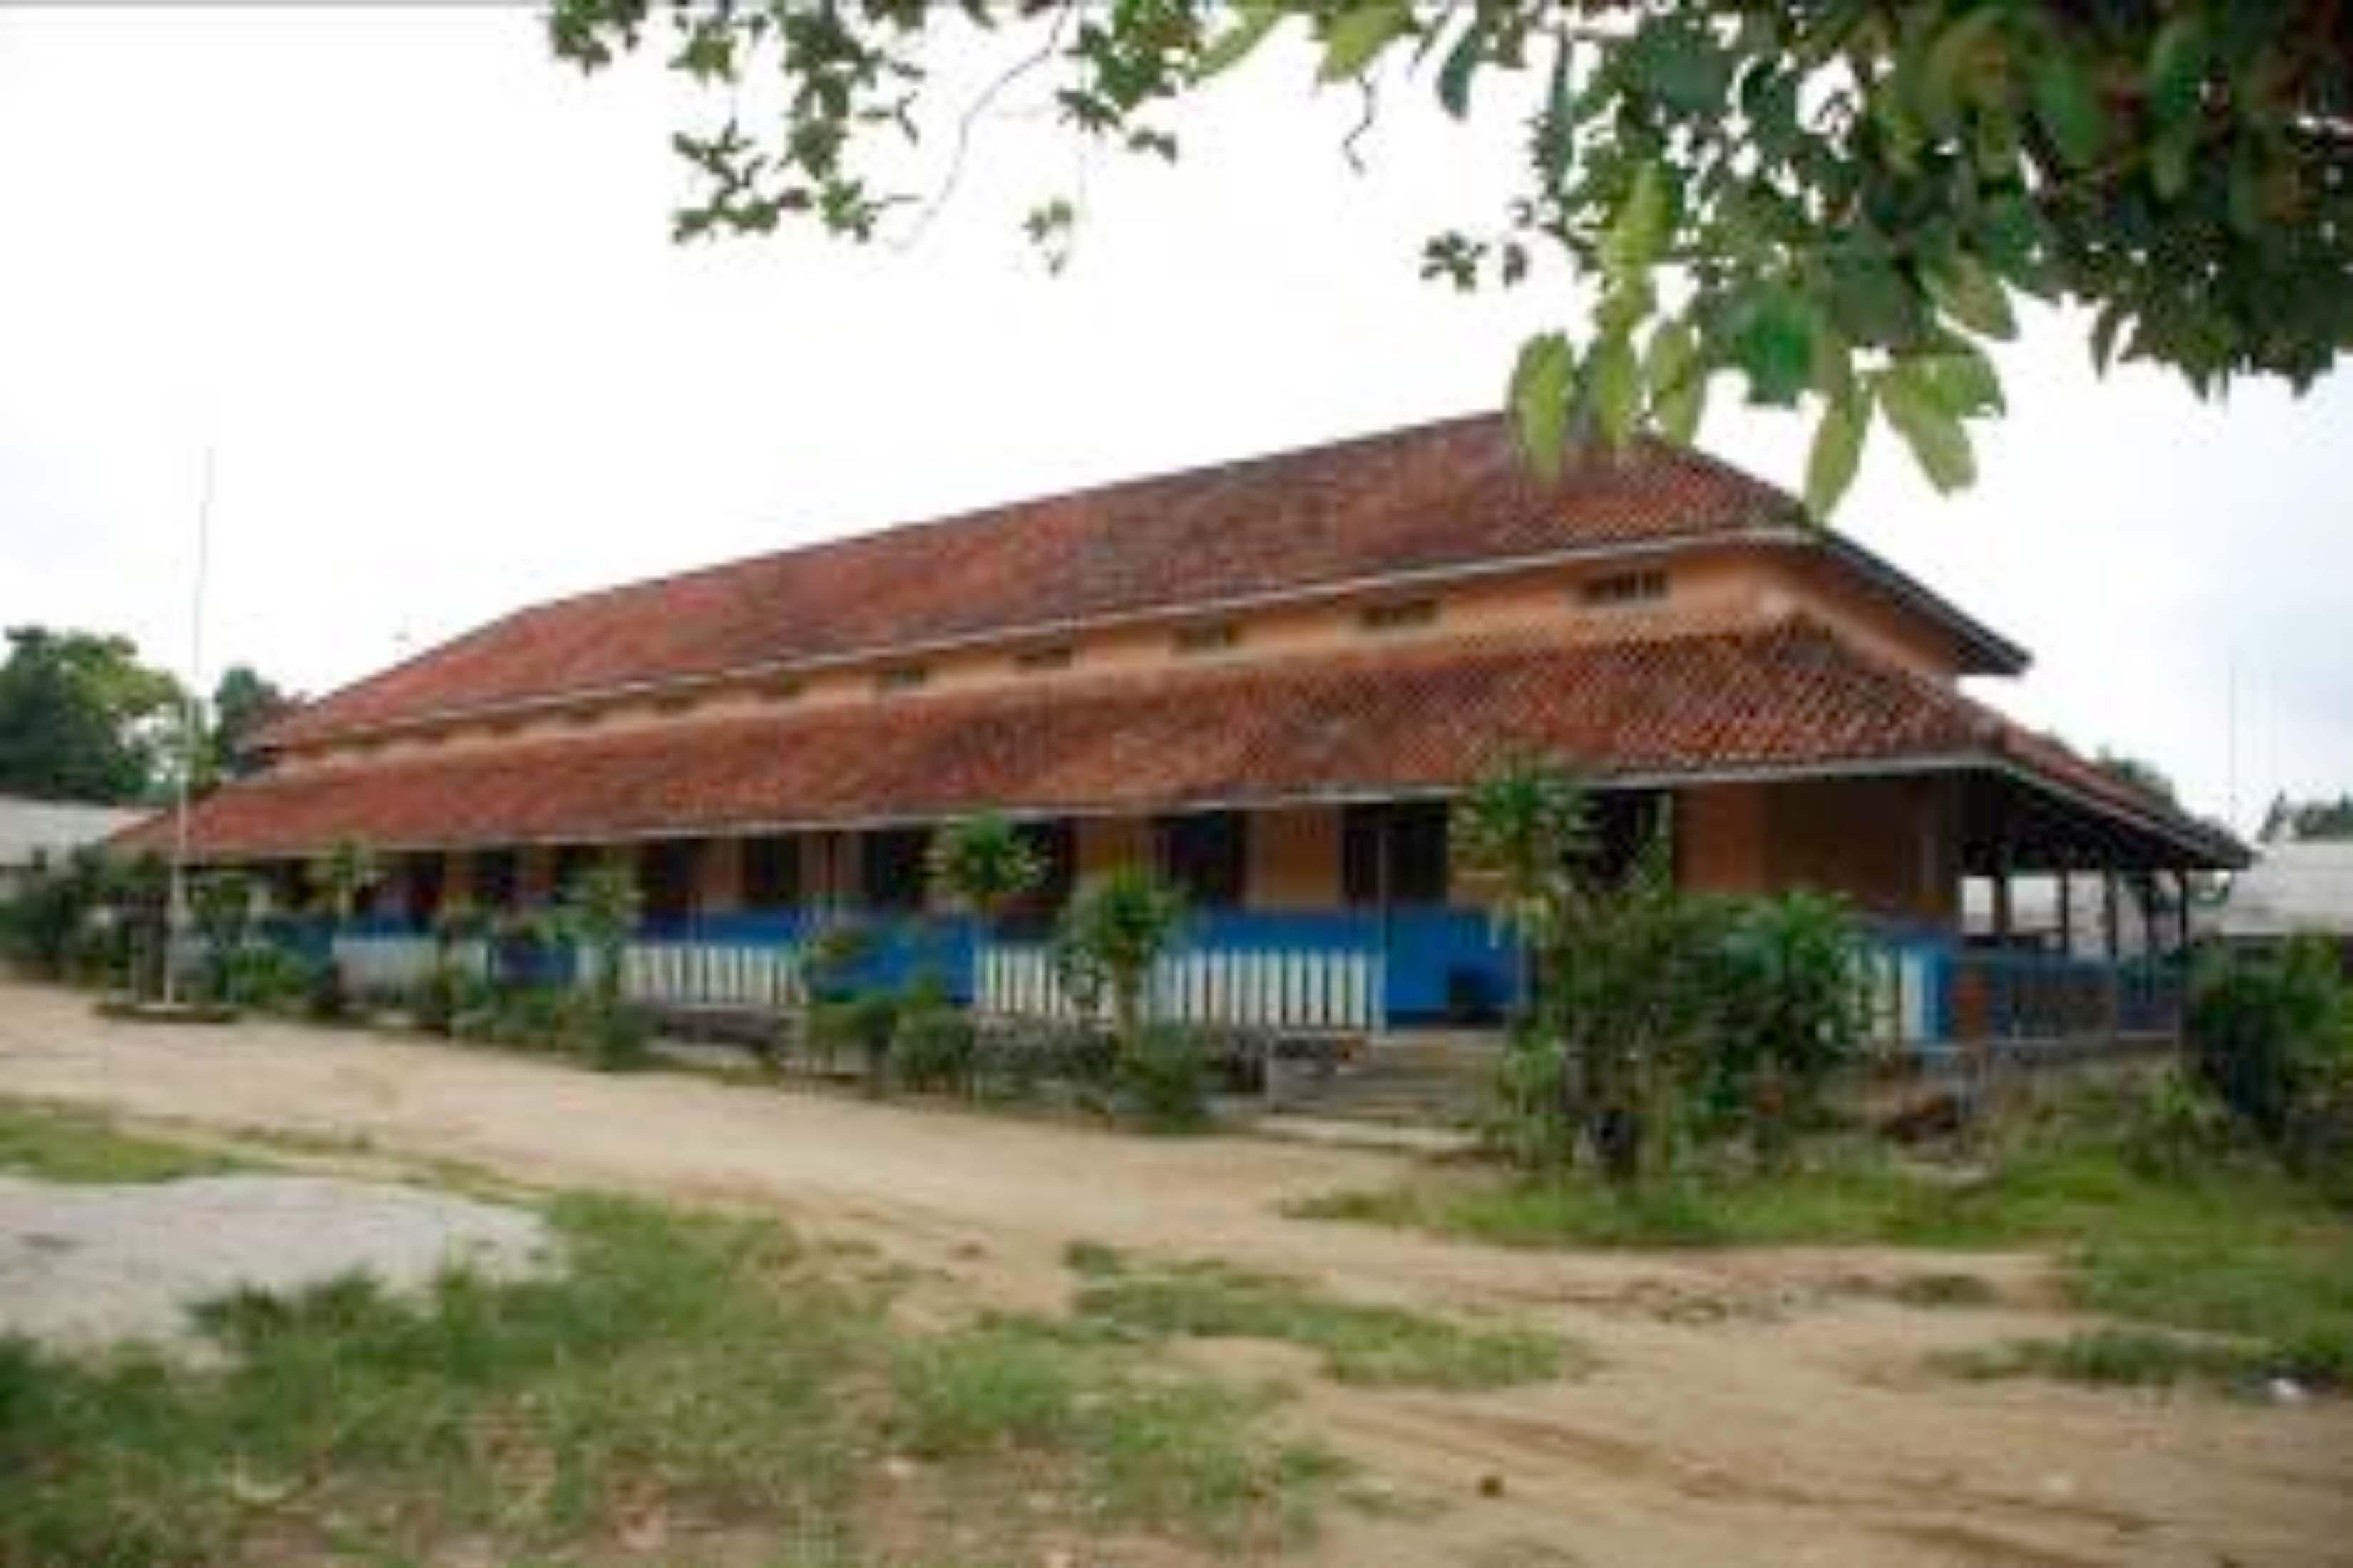 Holladsche Chineeshe School